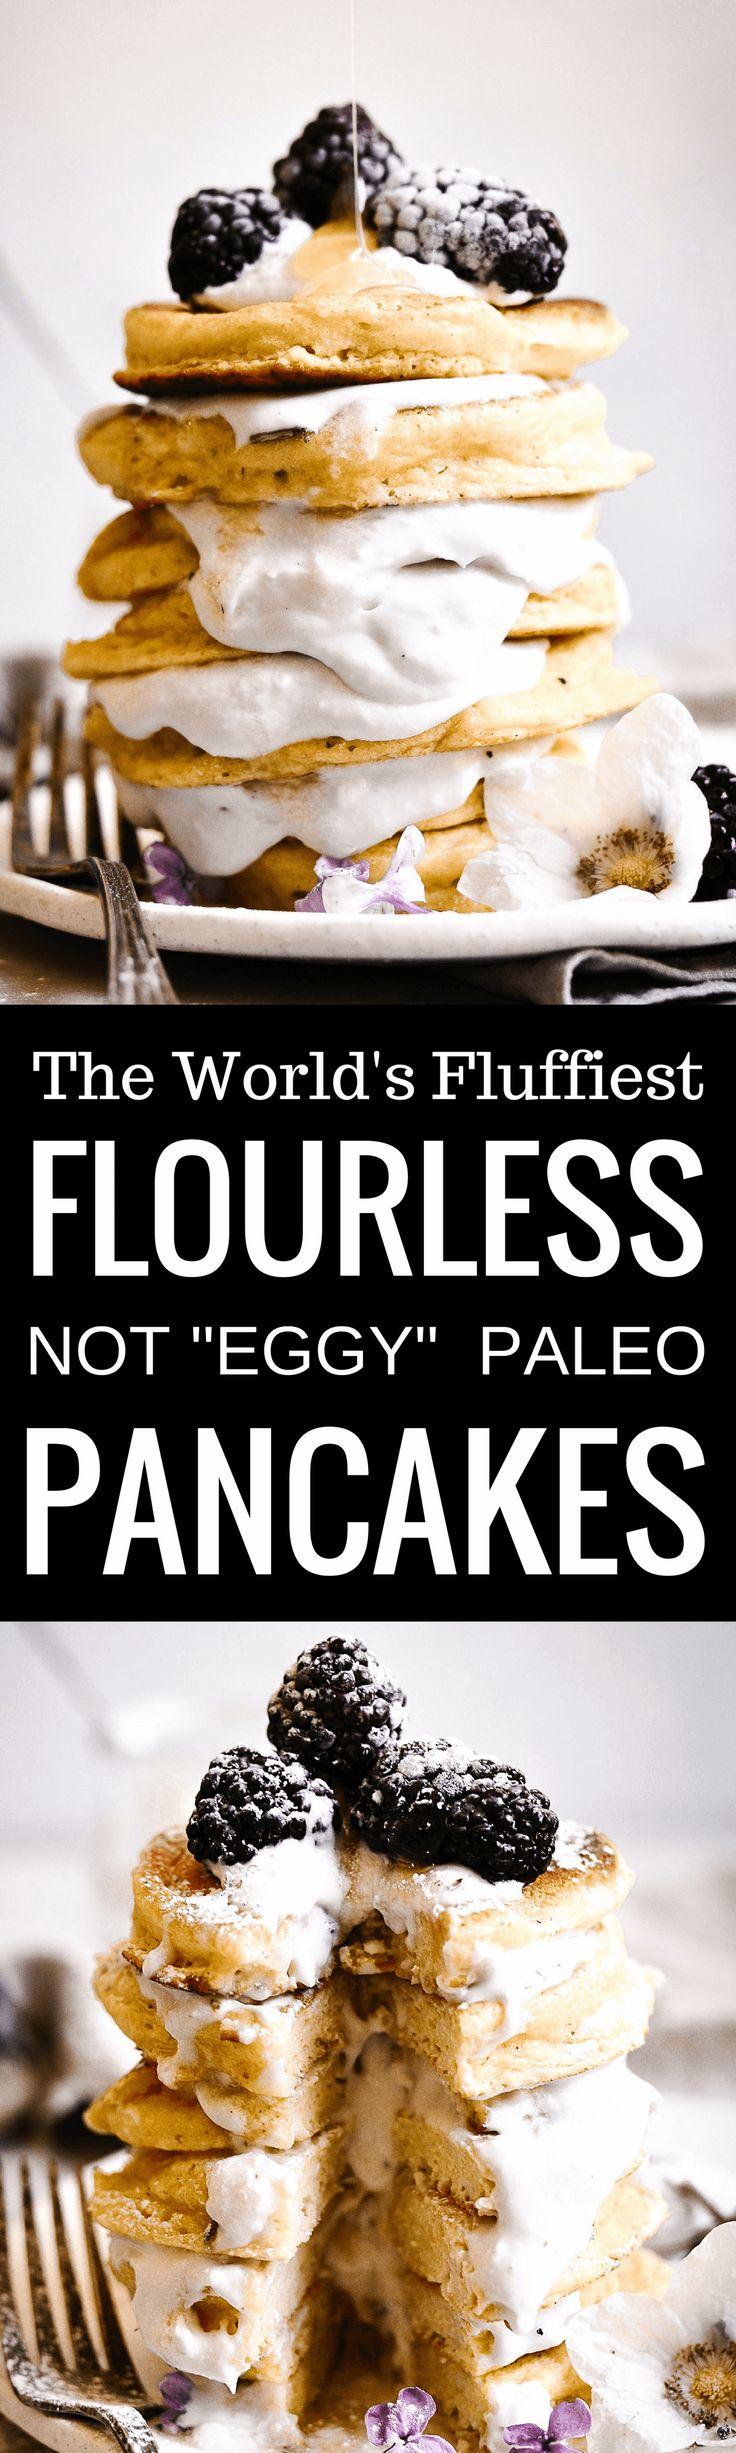 "The world's fluffiest paleo pancakes. Not ""eggy"", light, fluffy, thick, and satisfying. Tastes like legit white flour pancakes! Easy gluten free grain free"